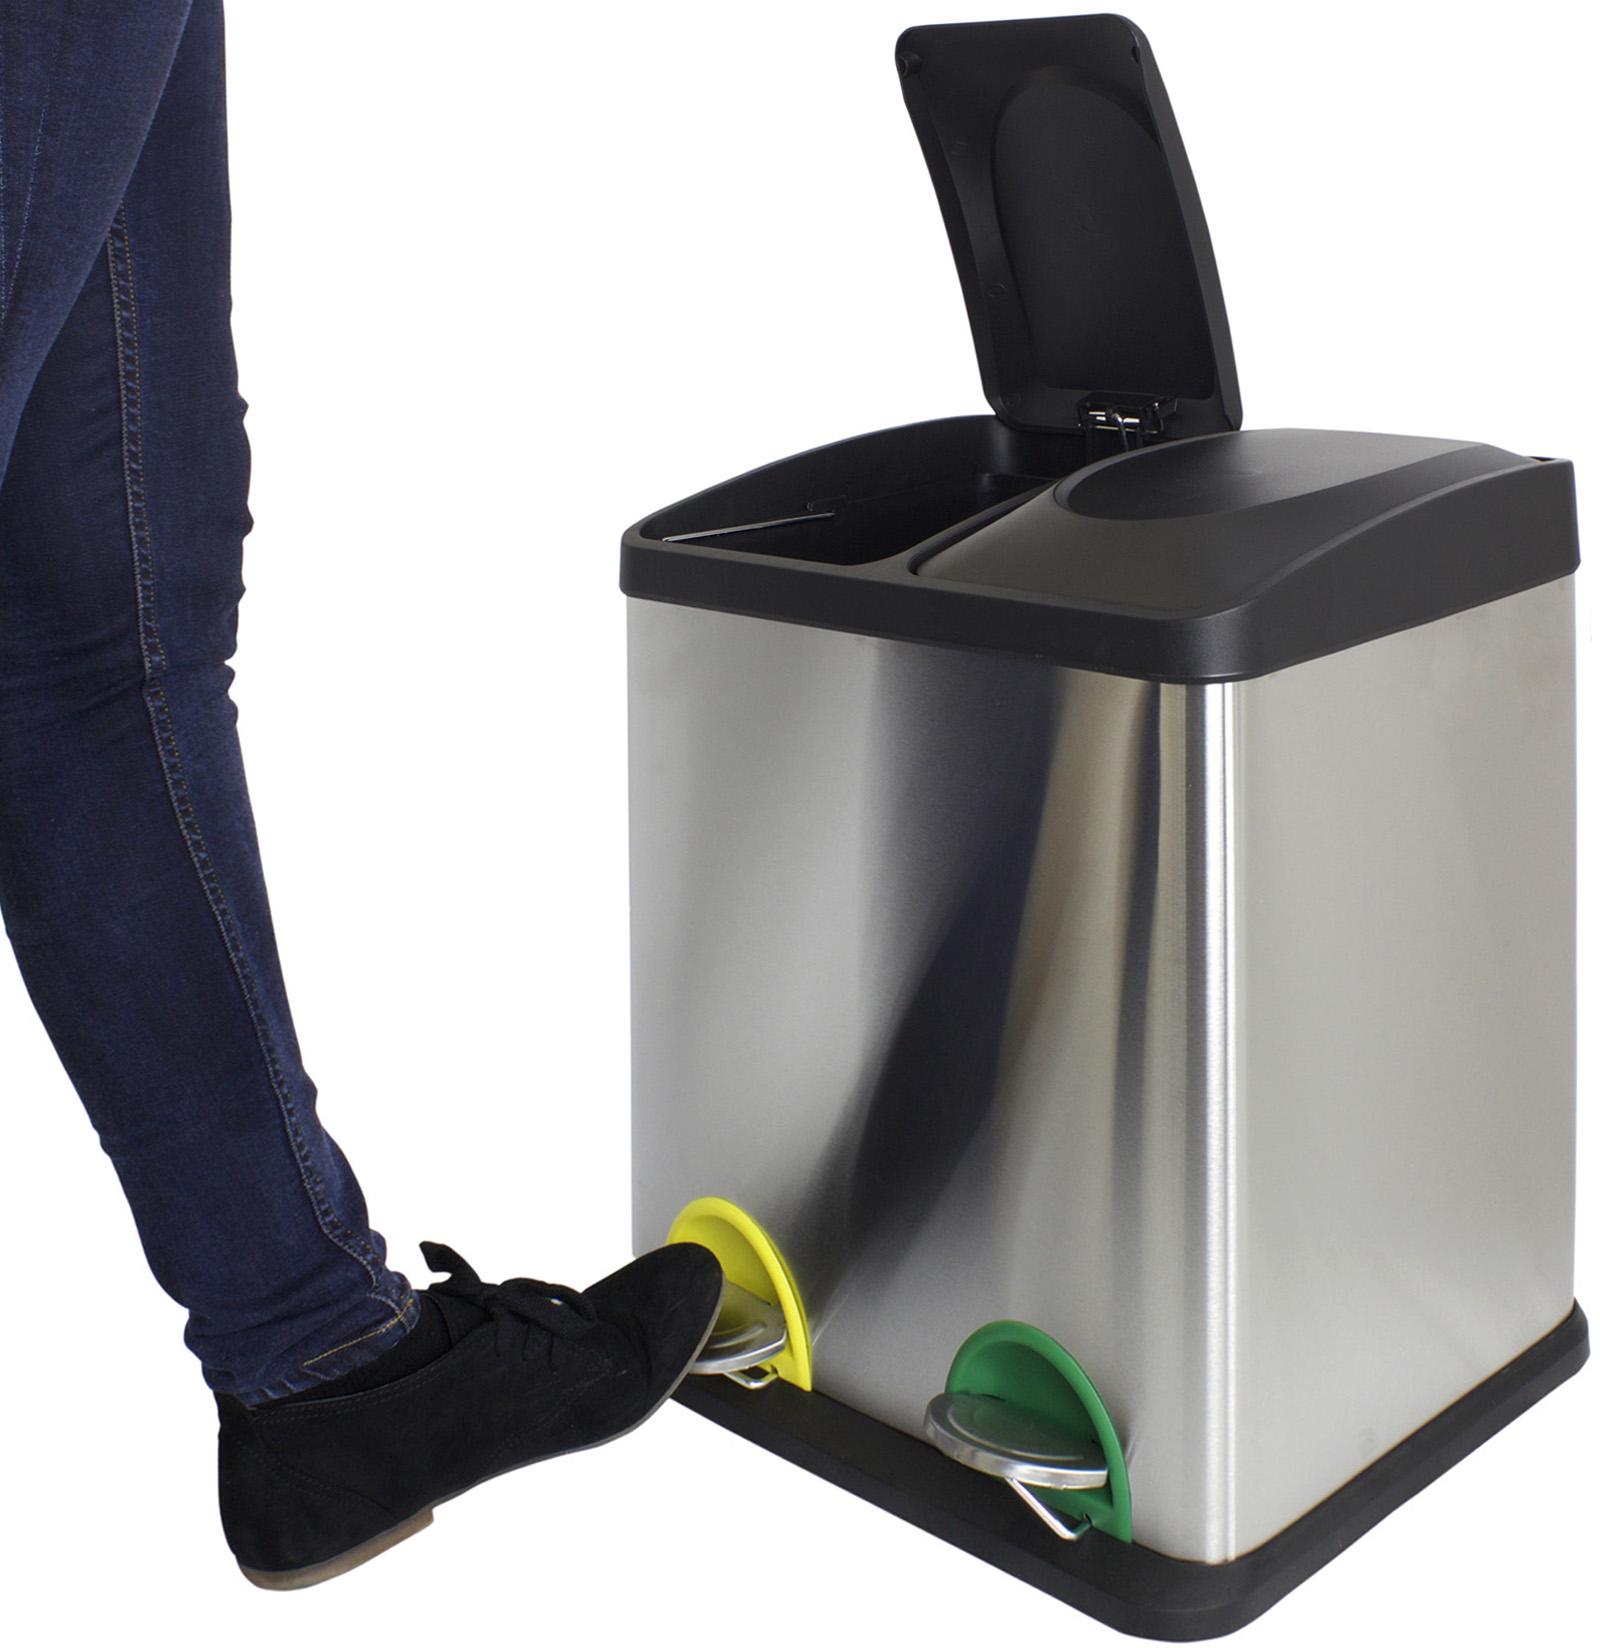 Sentinel 30 Litre Double Recycling Pedal Bin Twin Compartment Kitchen Rubbish Waste 30l